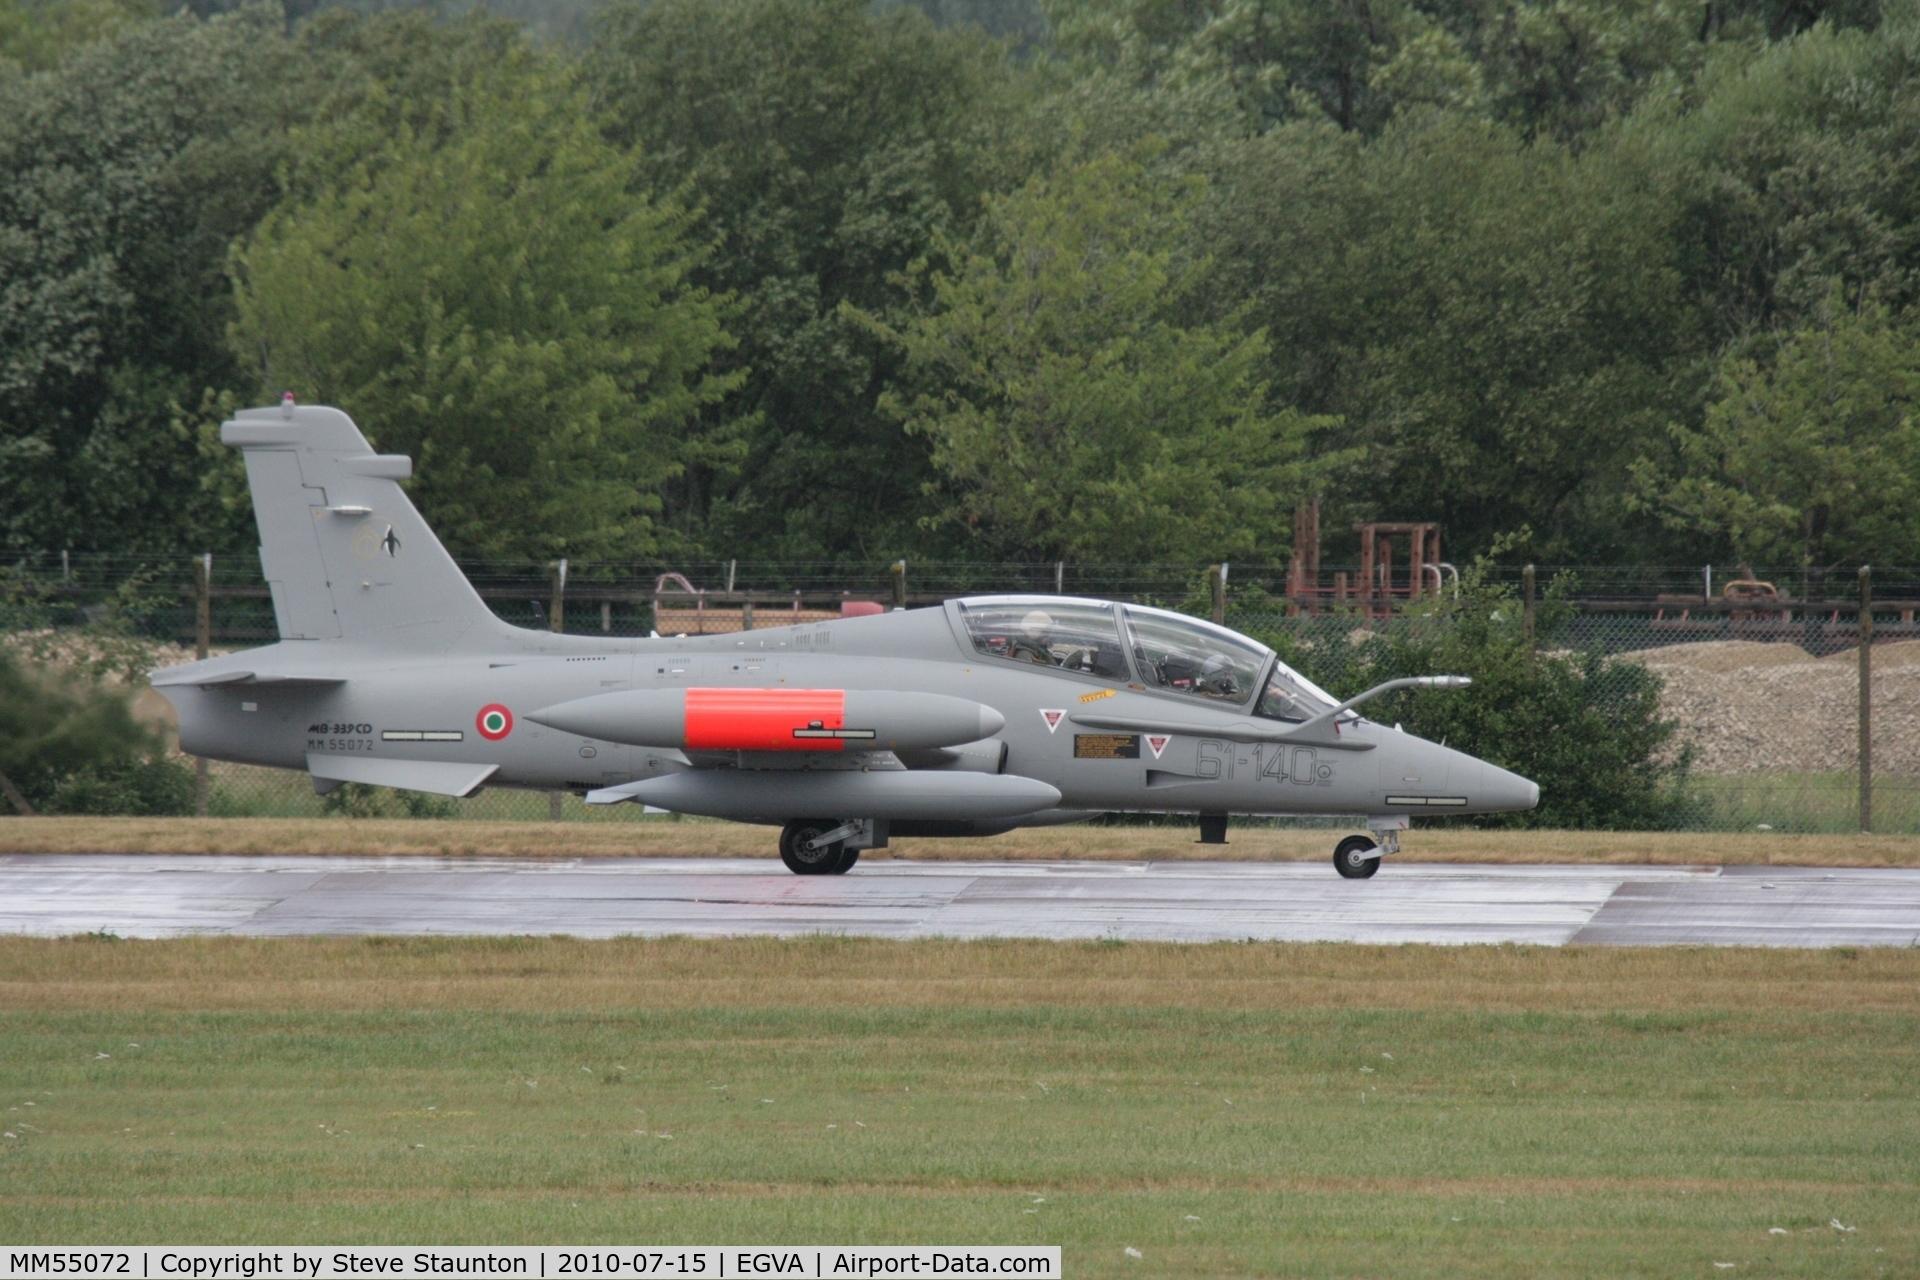 MM55072, Aermacchi MB-339CD C/N 6876/204/CD011, Taken at the Royal International Air Tattoo 2010